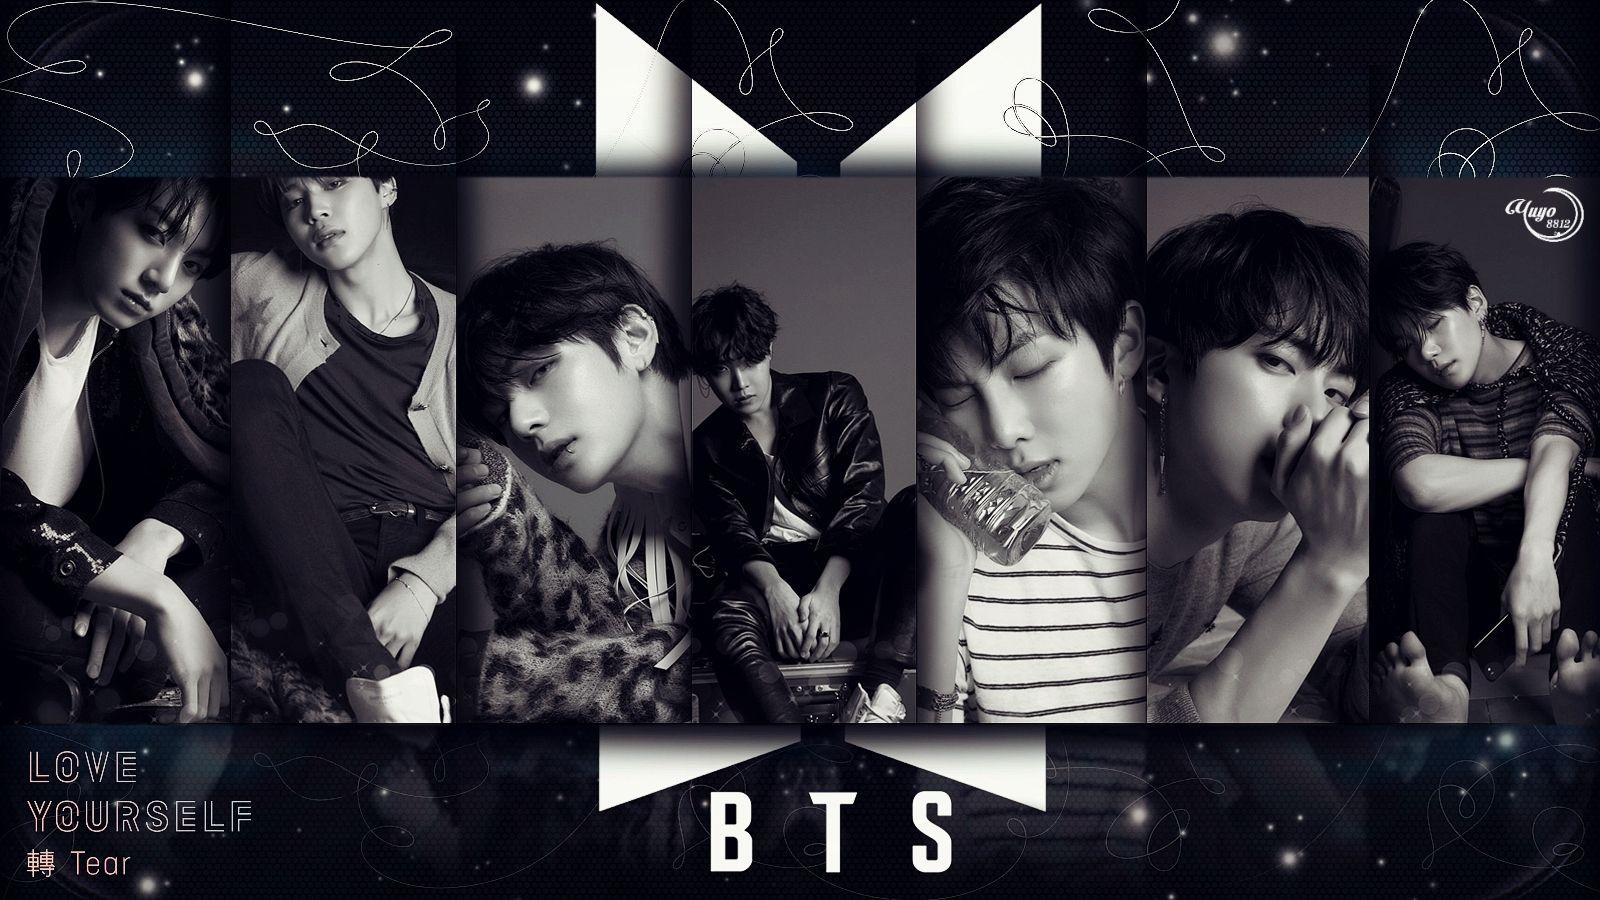 Wallpaper Of Bts Fake Love Wallpaper For Fans Of Yulliyo8812 Bts Jimin Jin Suga Rm J Hope Jungkook V Bts Walpaper Fake Love Bts Love Yourself